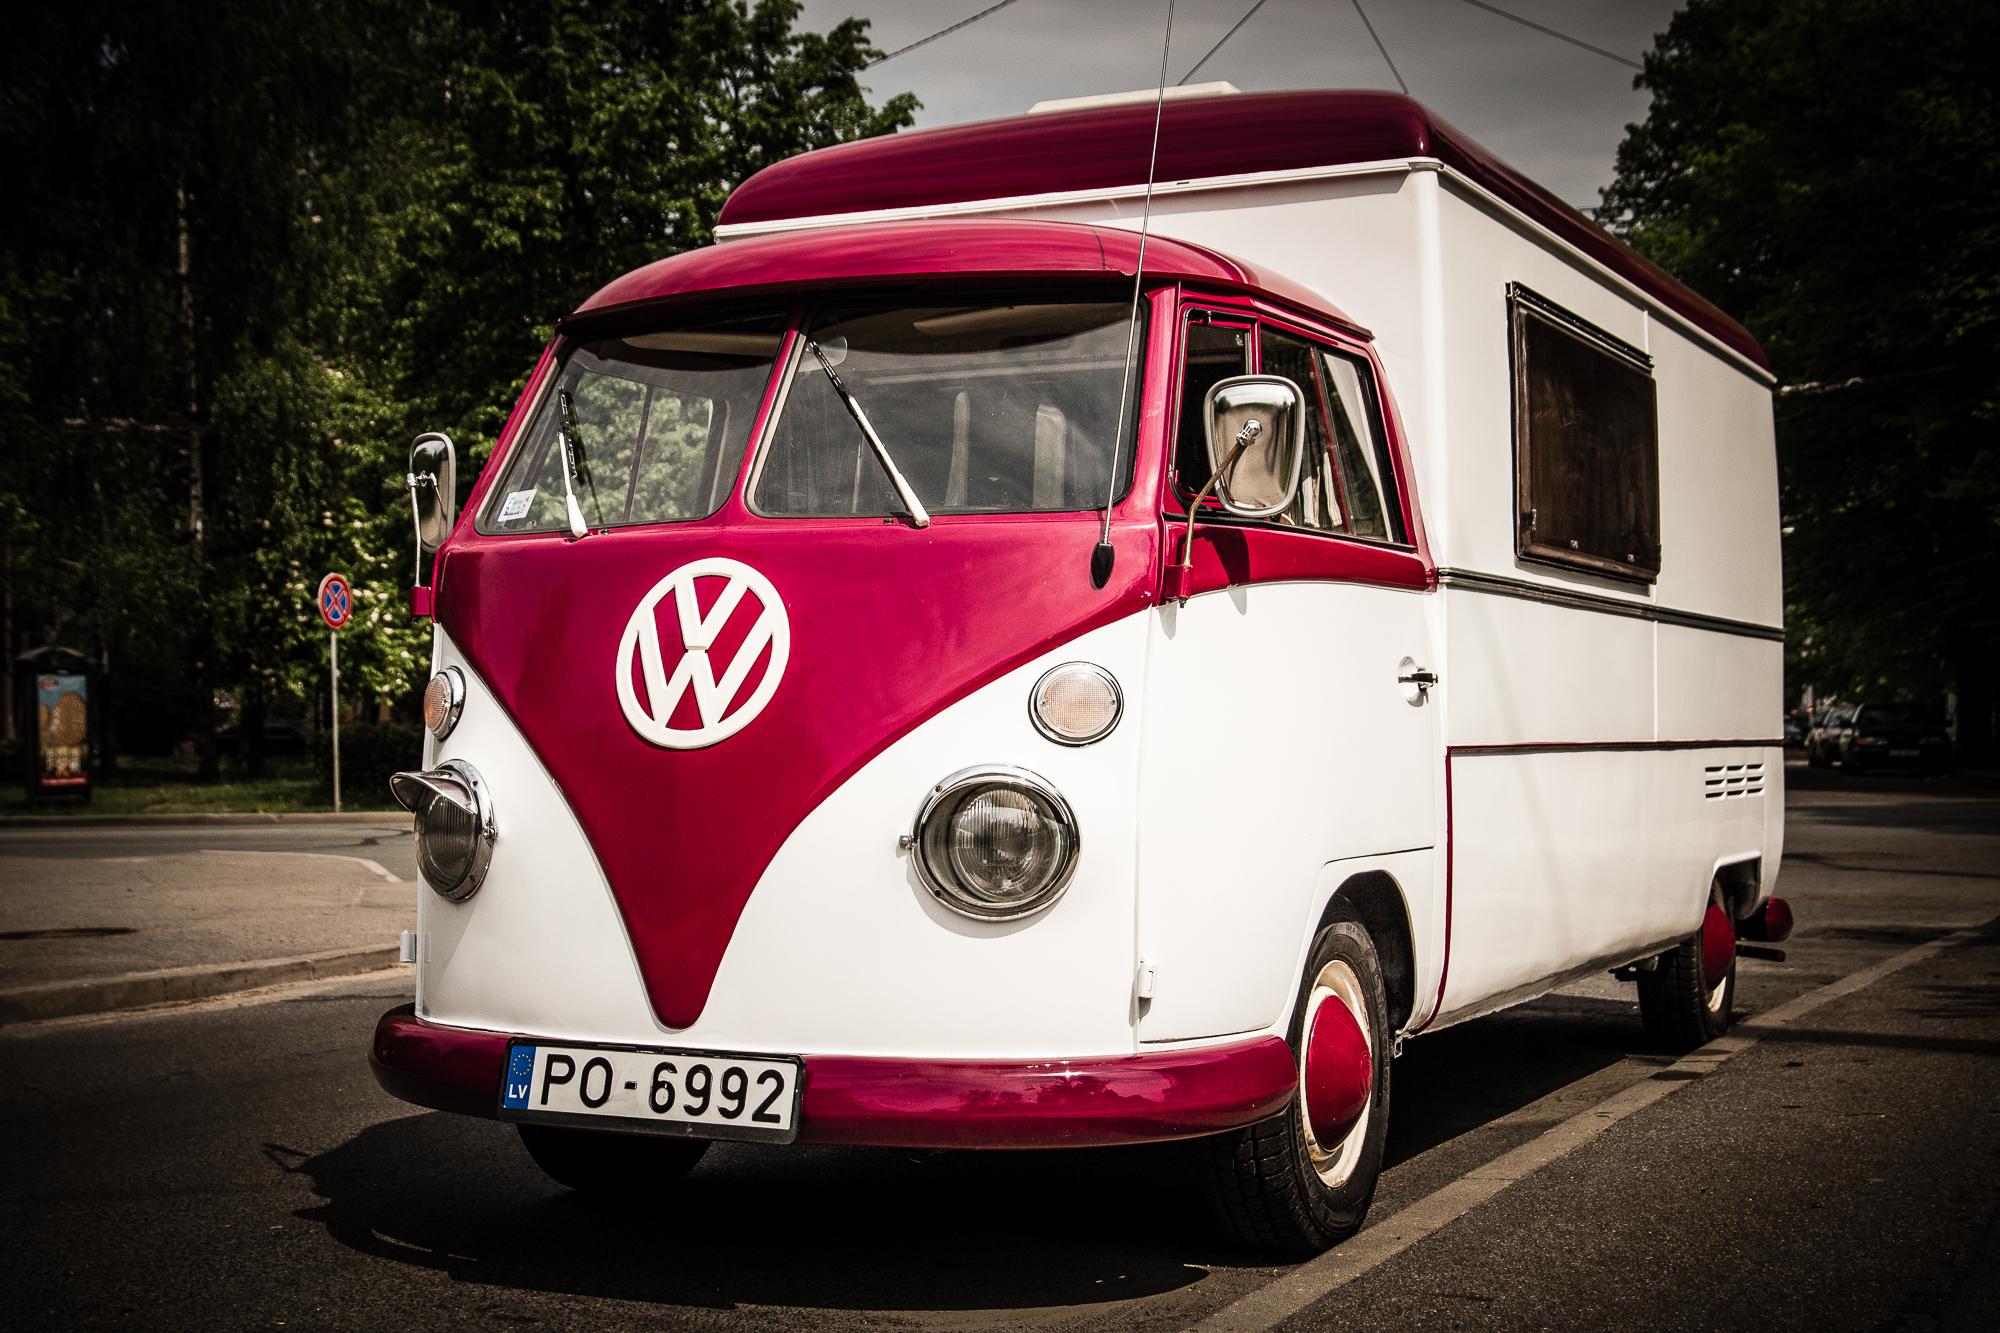 Volkswagen Bus Via @Atisgailis